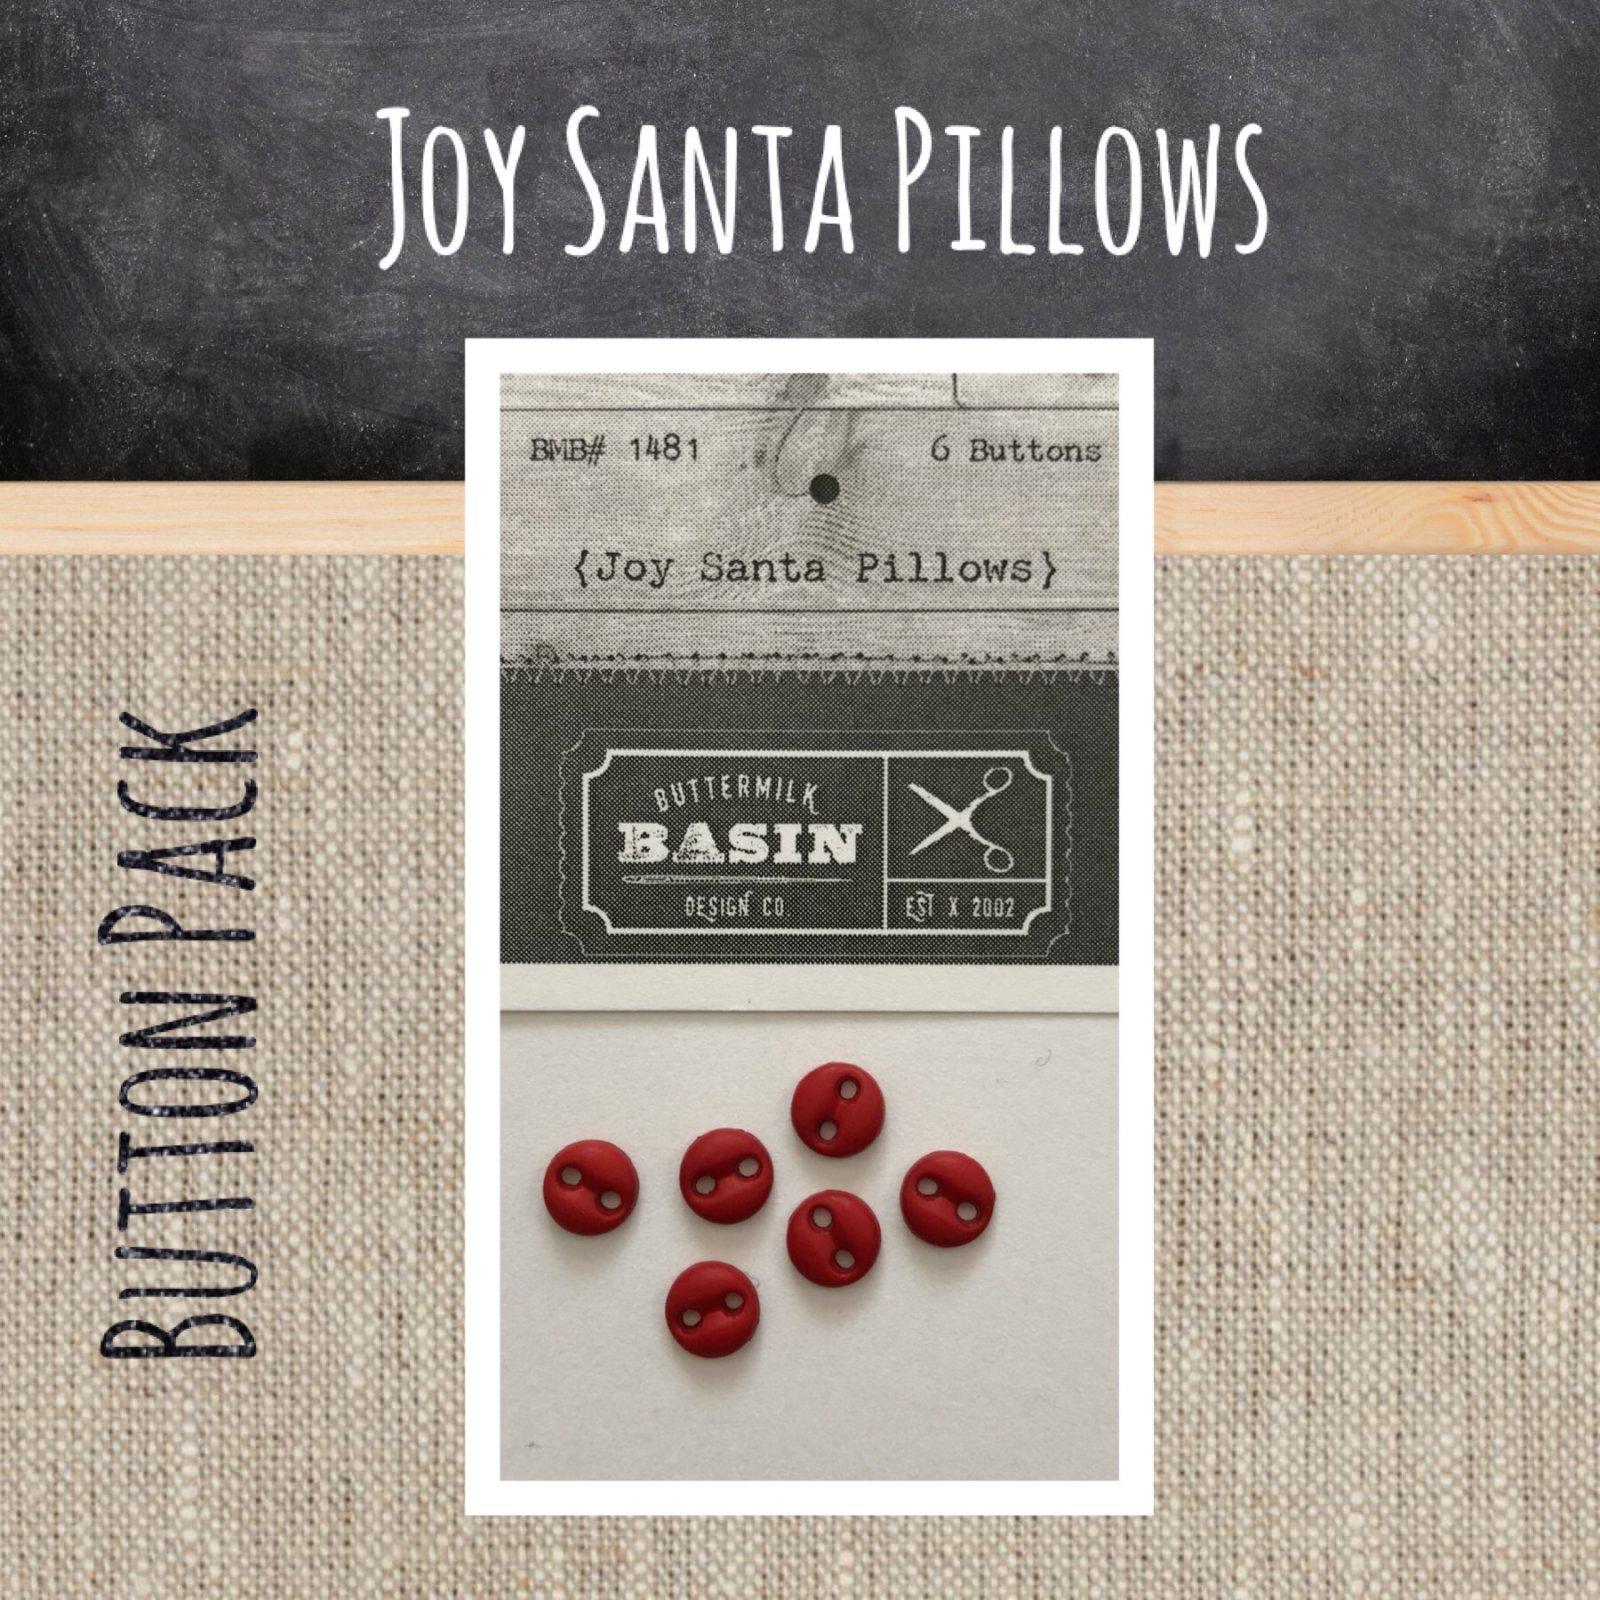 Joy Santa Pillows BUTTON pack